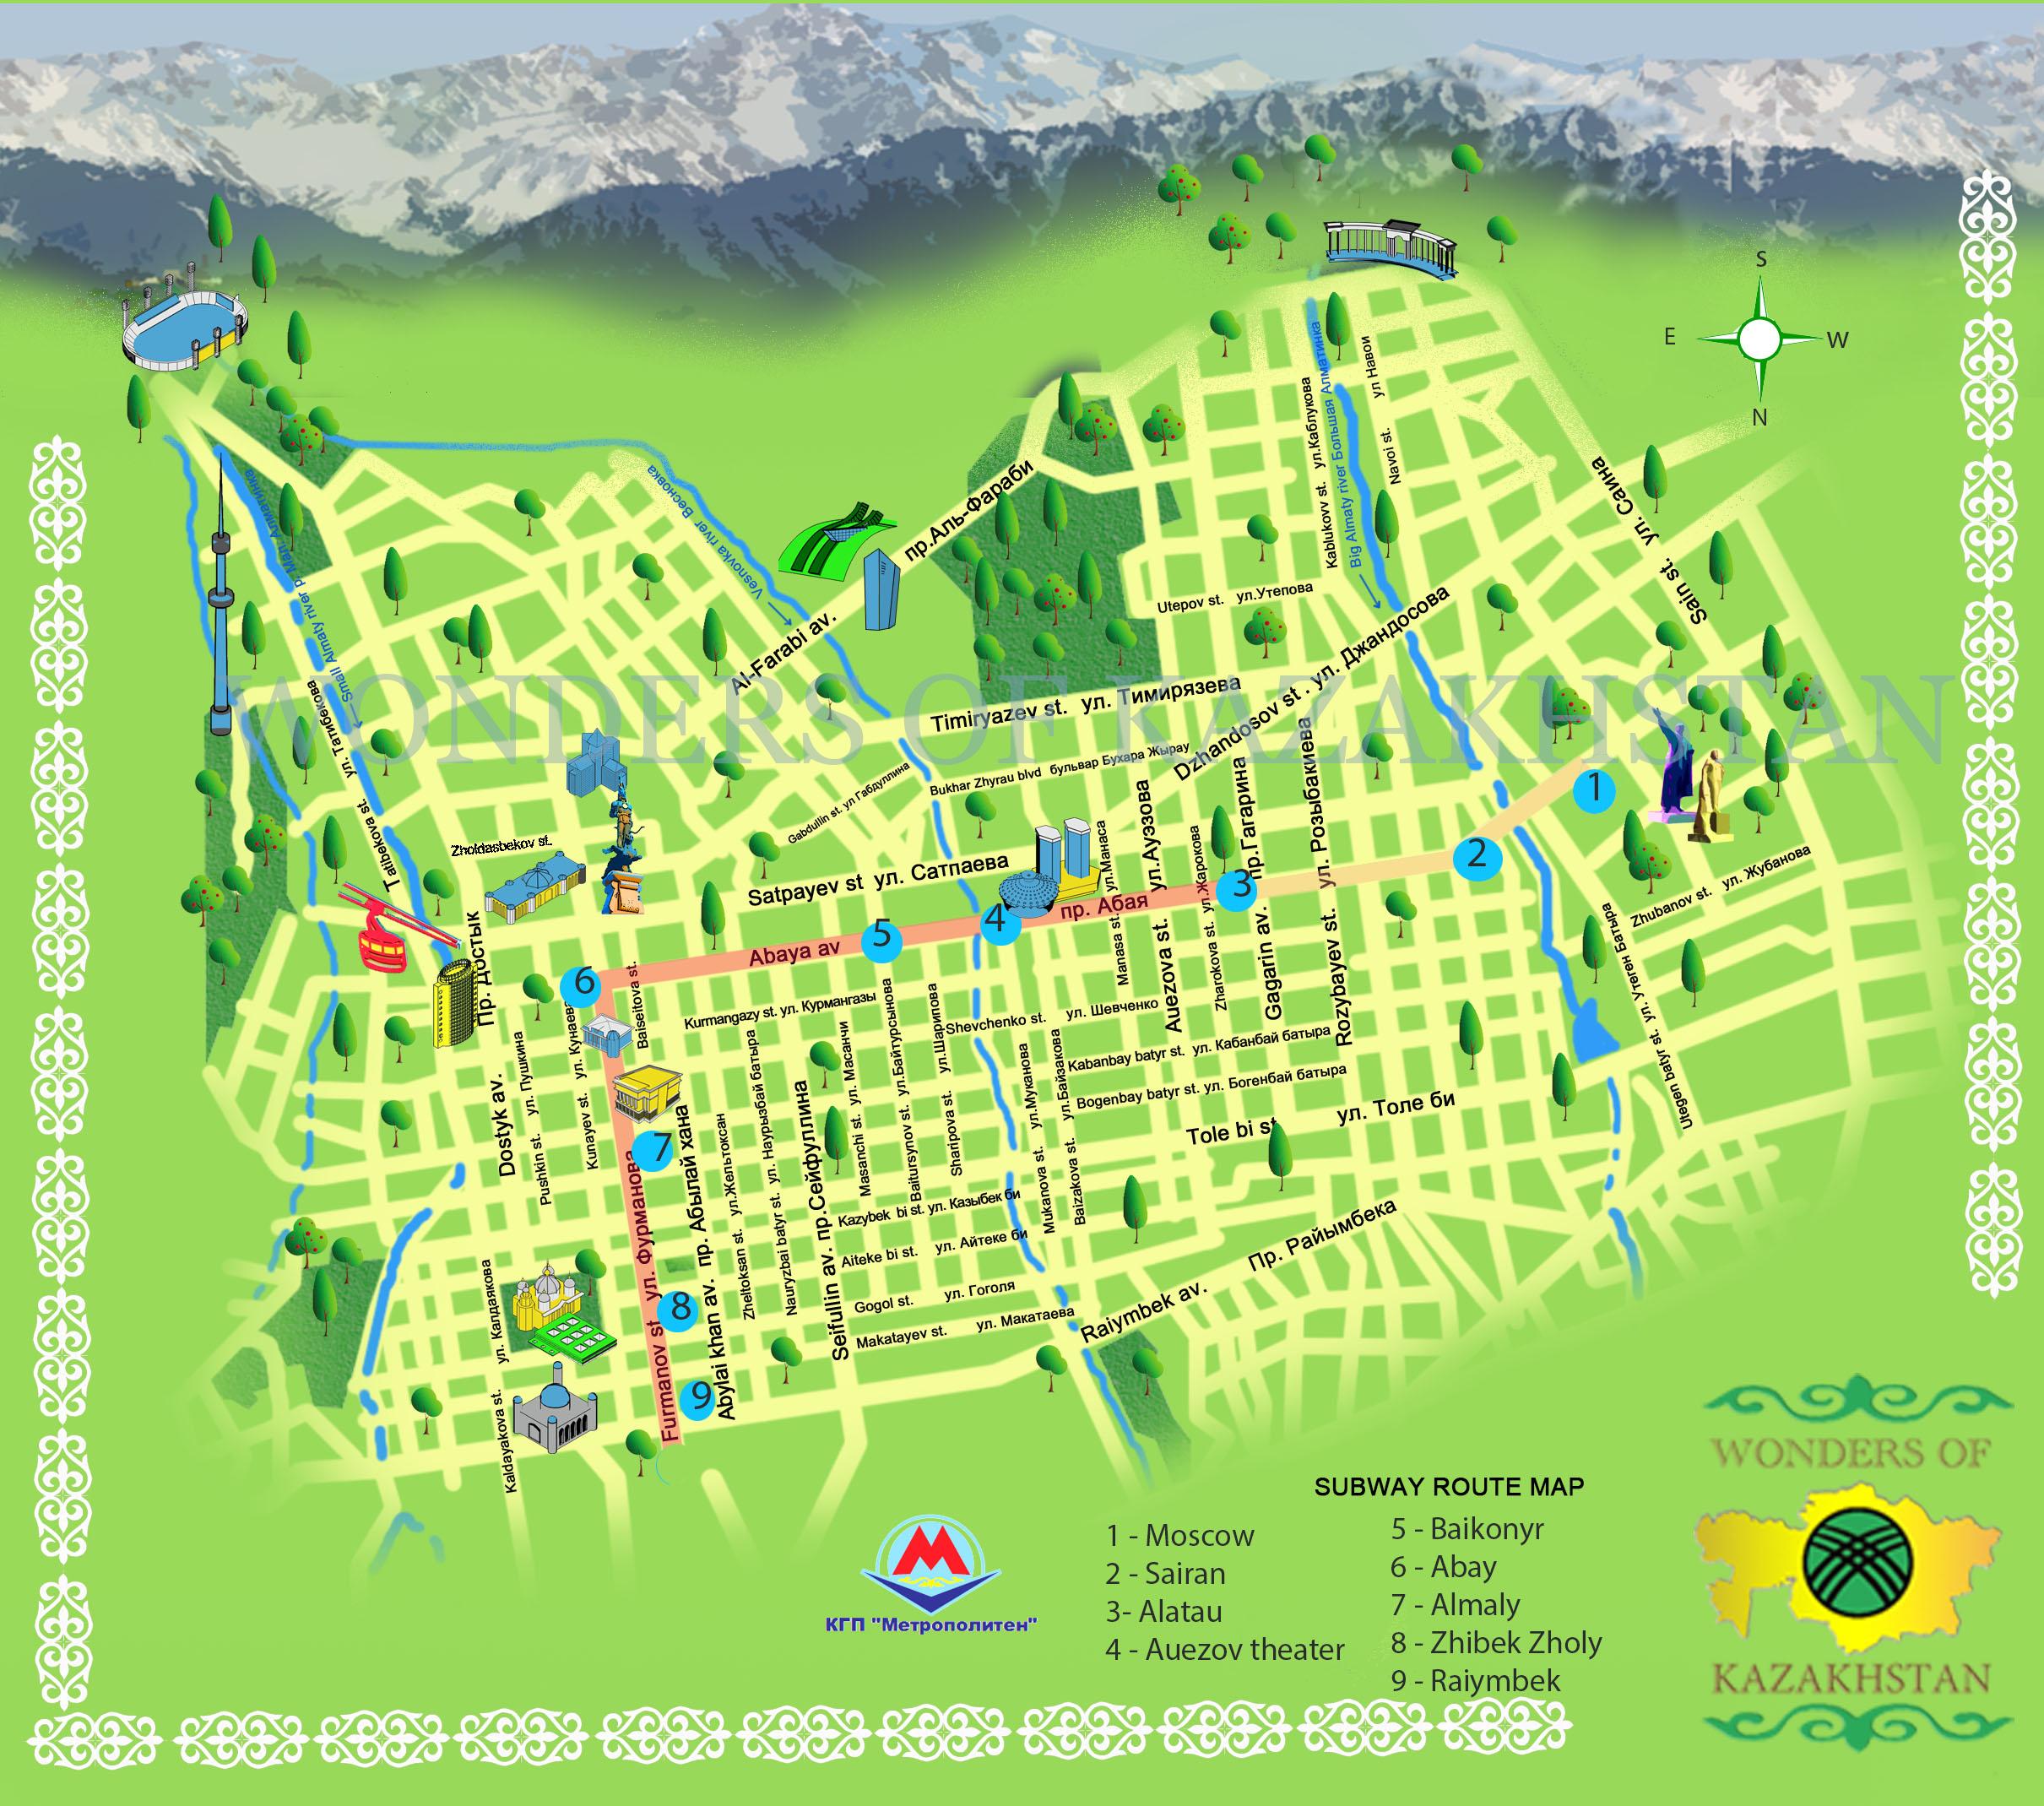 Almaty Sightseeing and Subway map wondersofkazakhstankz